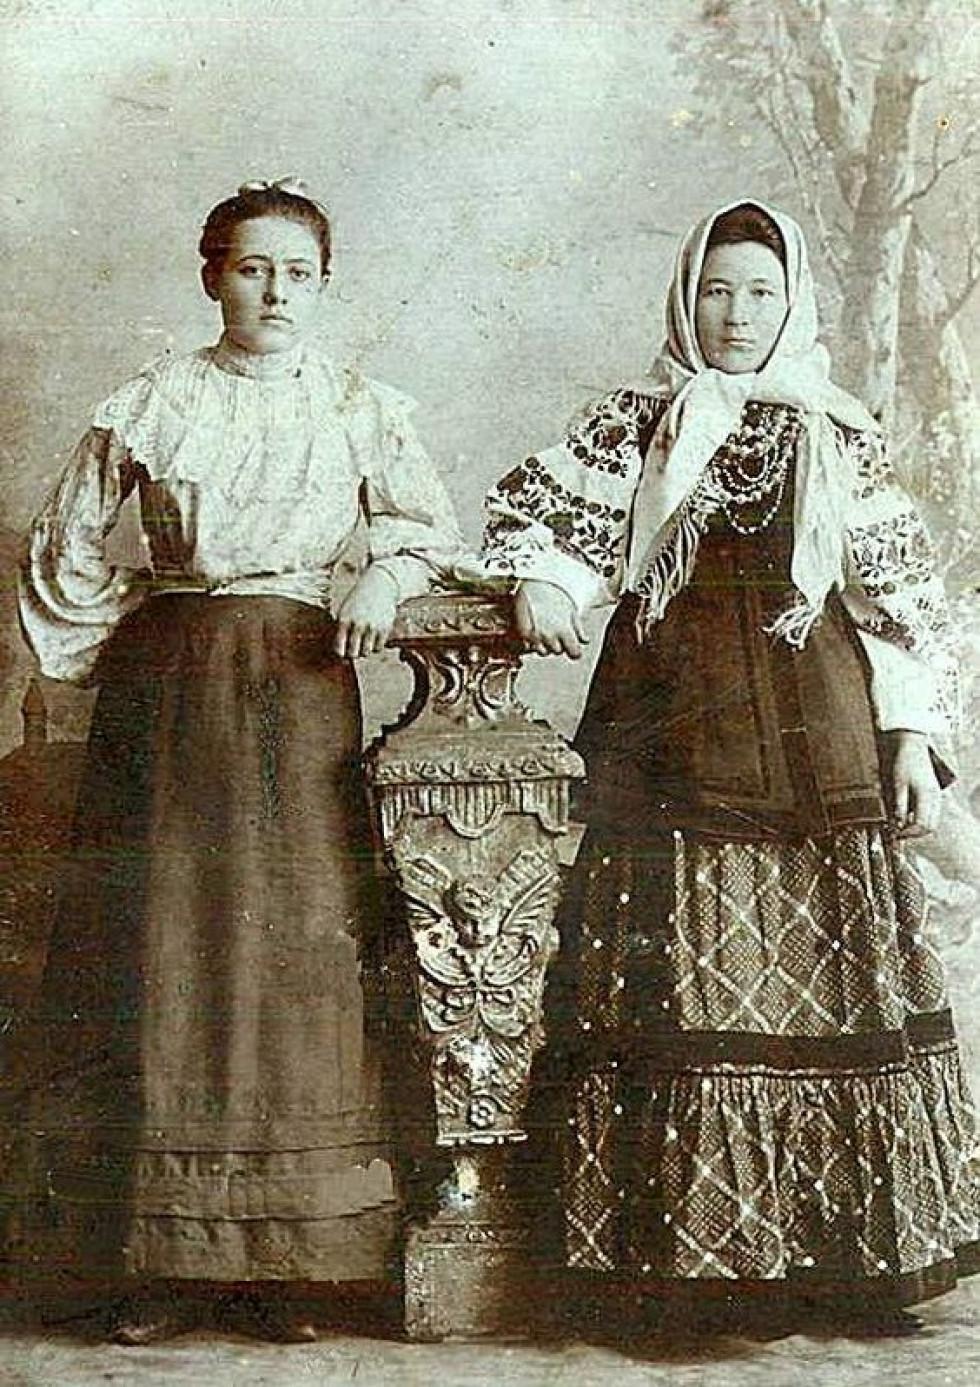 Мачуха з падчеркою. Юзівка (Донецьк) 1904